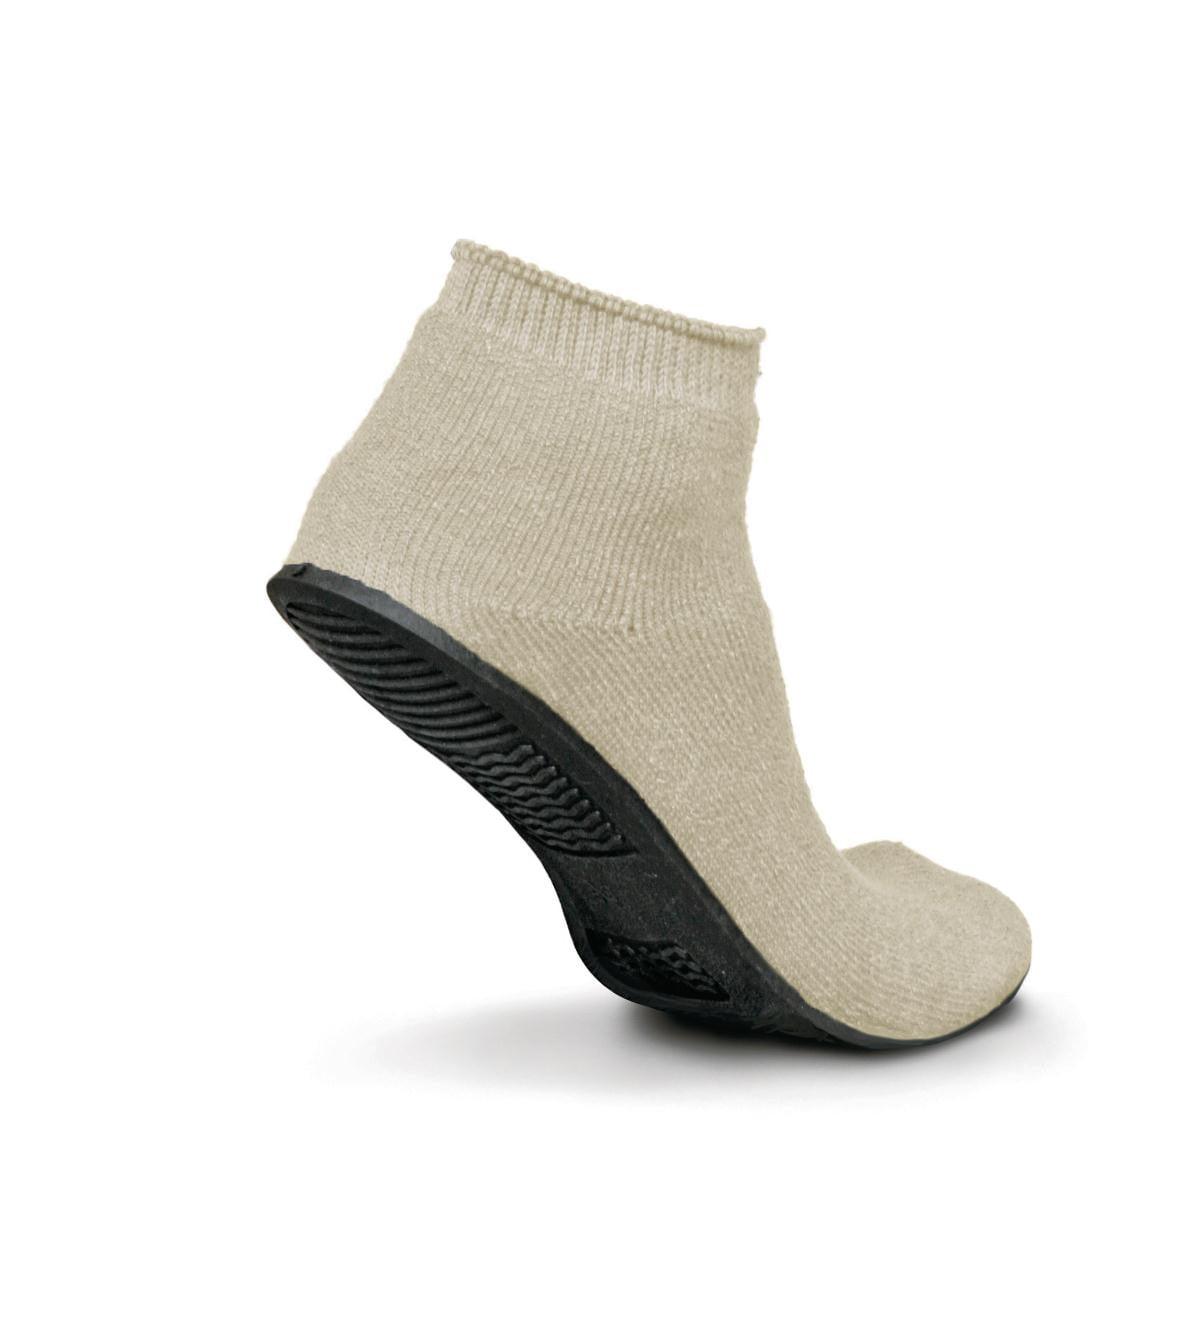 Terrycloth Low Ribbed Ankle Slipper Socks (1 Dozen)